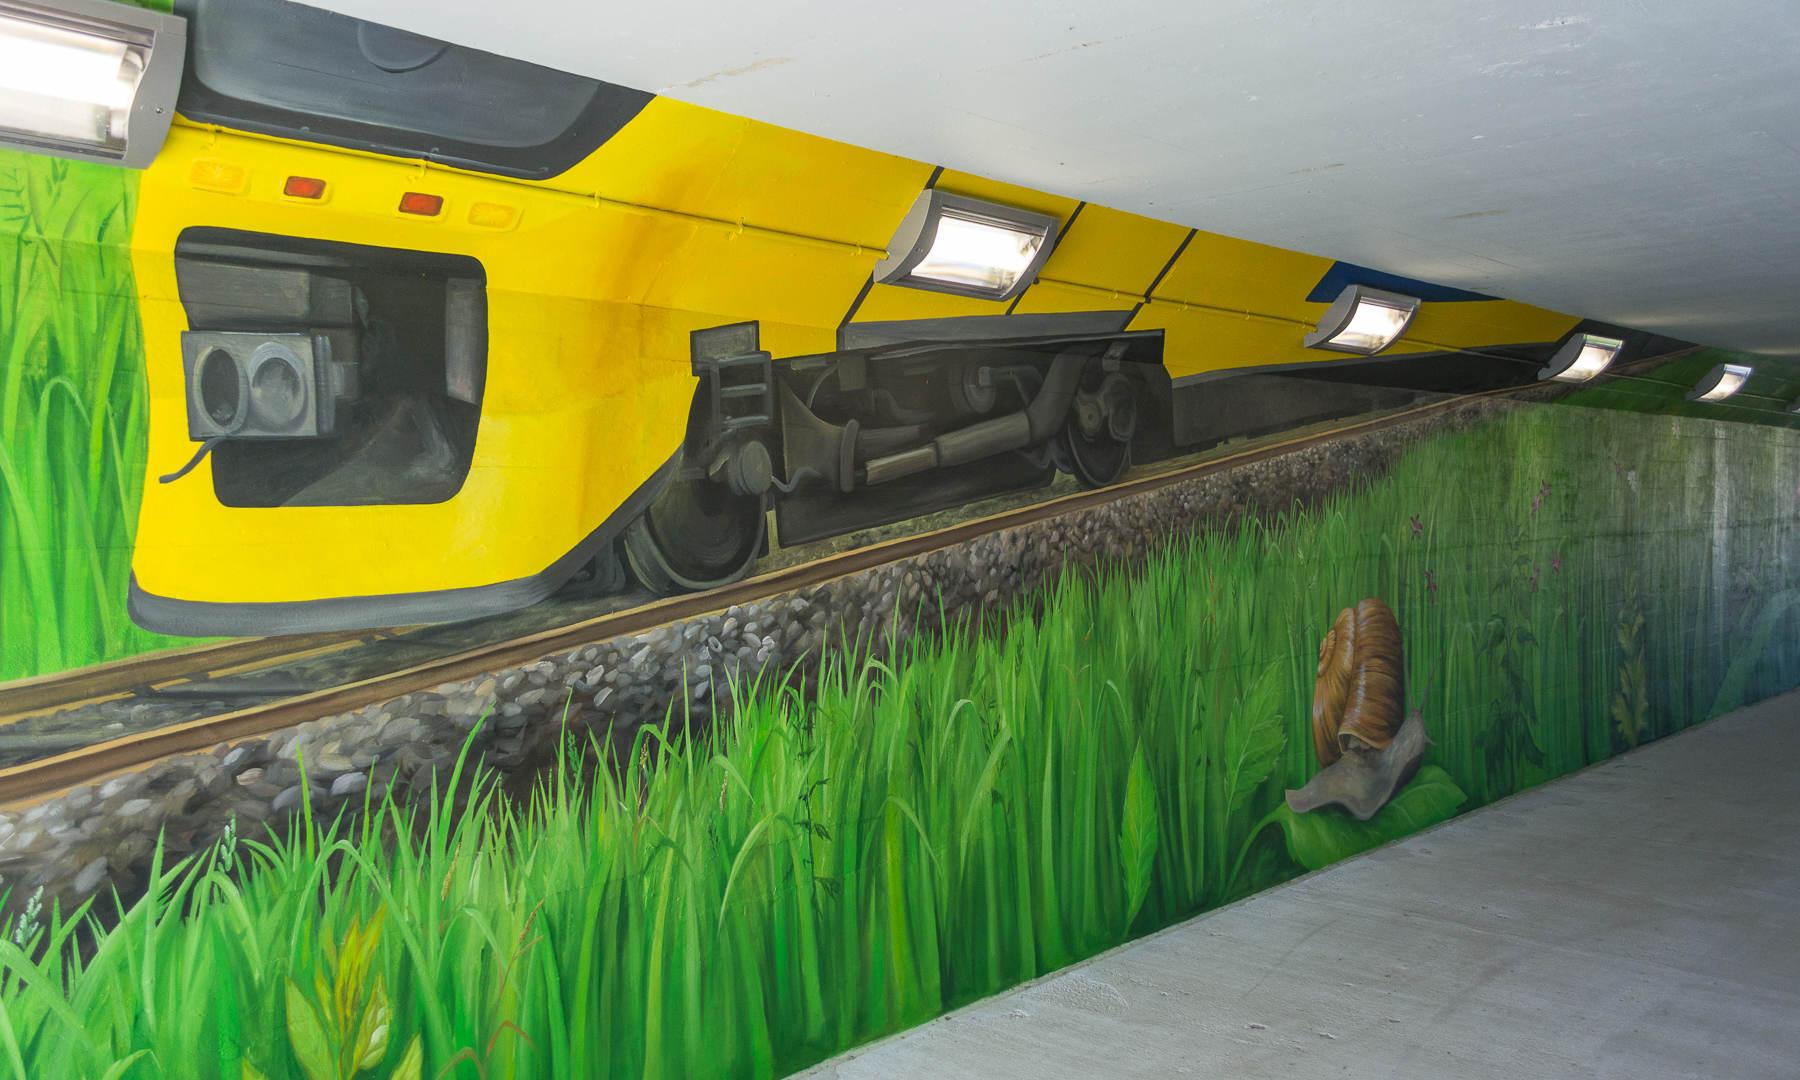 Zandsloottunnel, Sassenheim